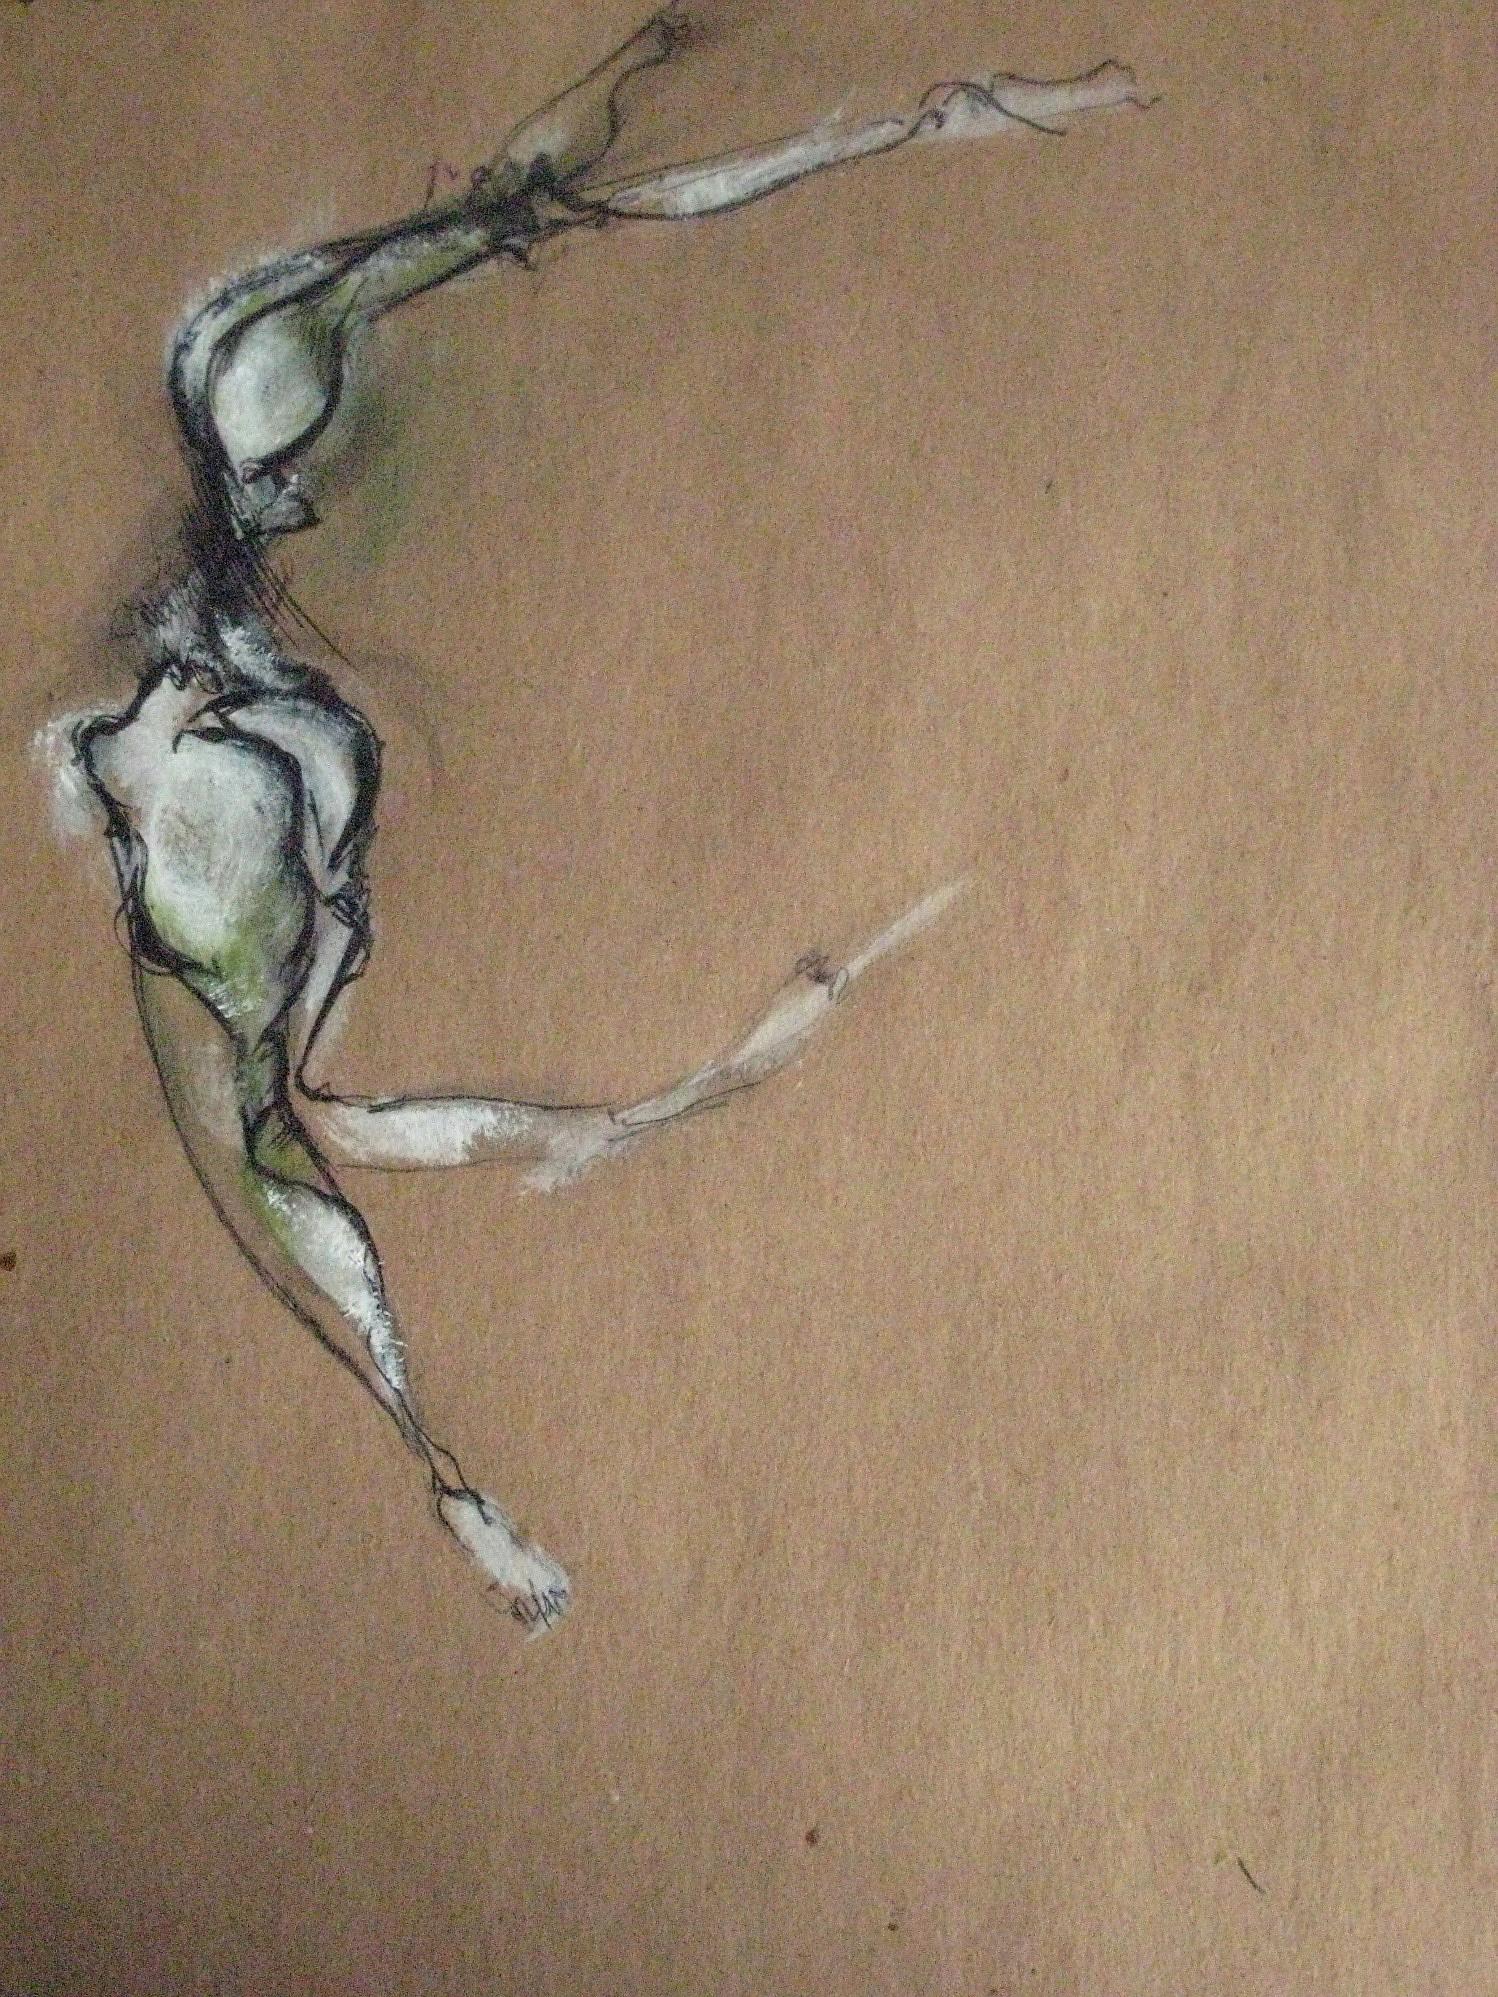 acrylic, watercolor, pencil, 2008  16 x 20 inches